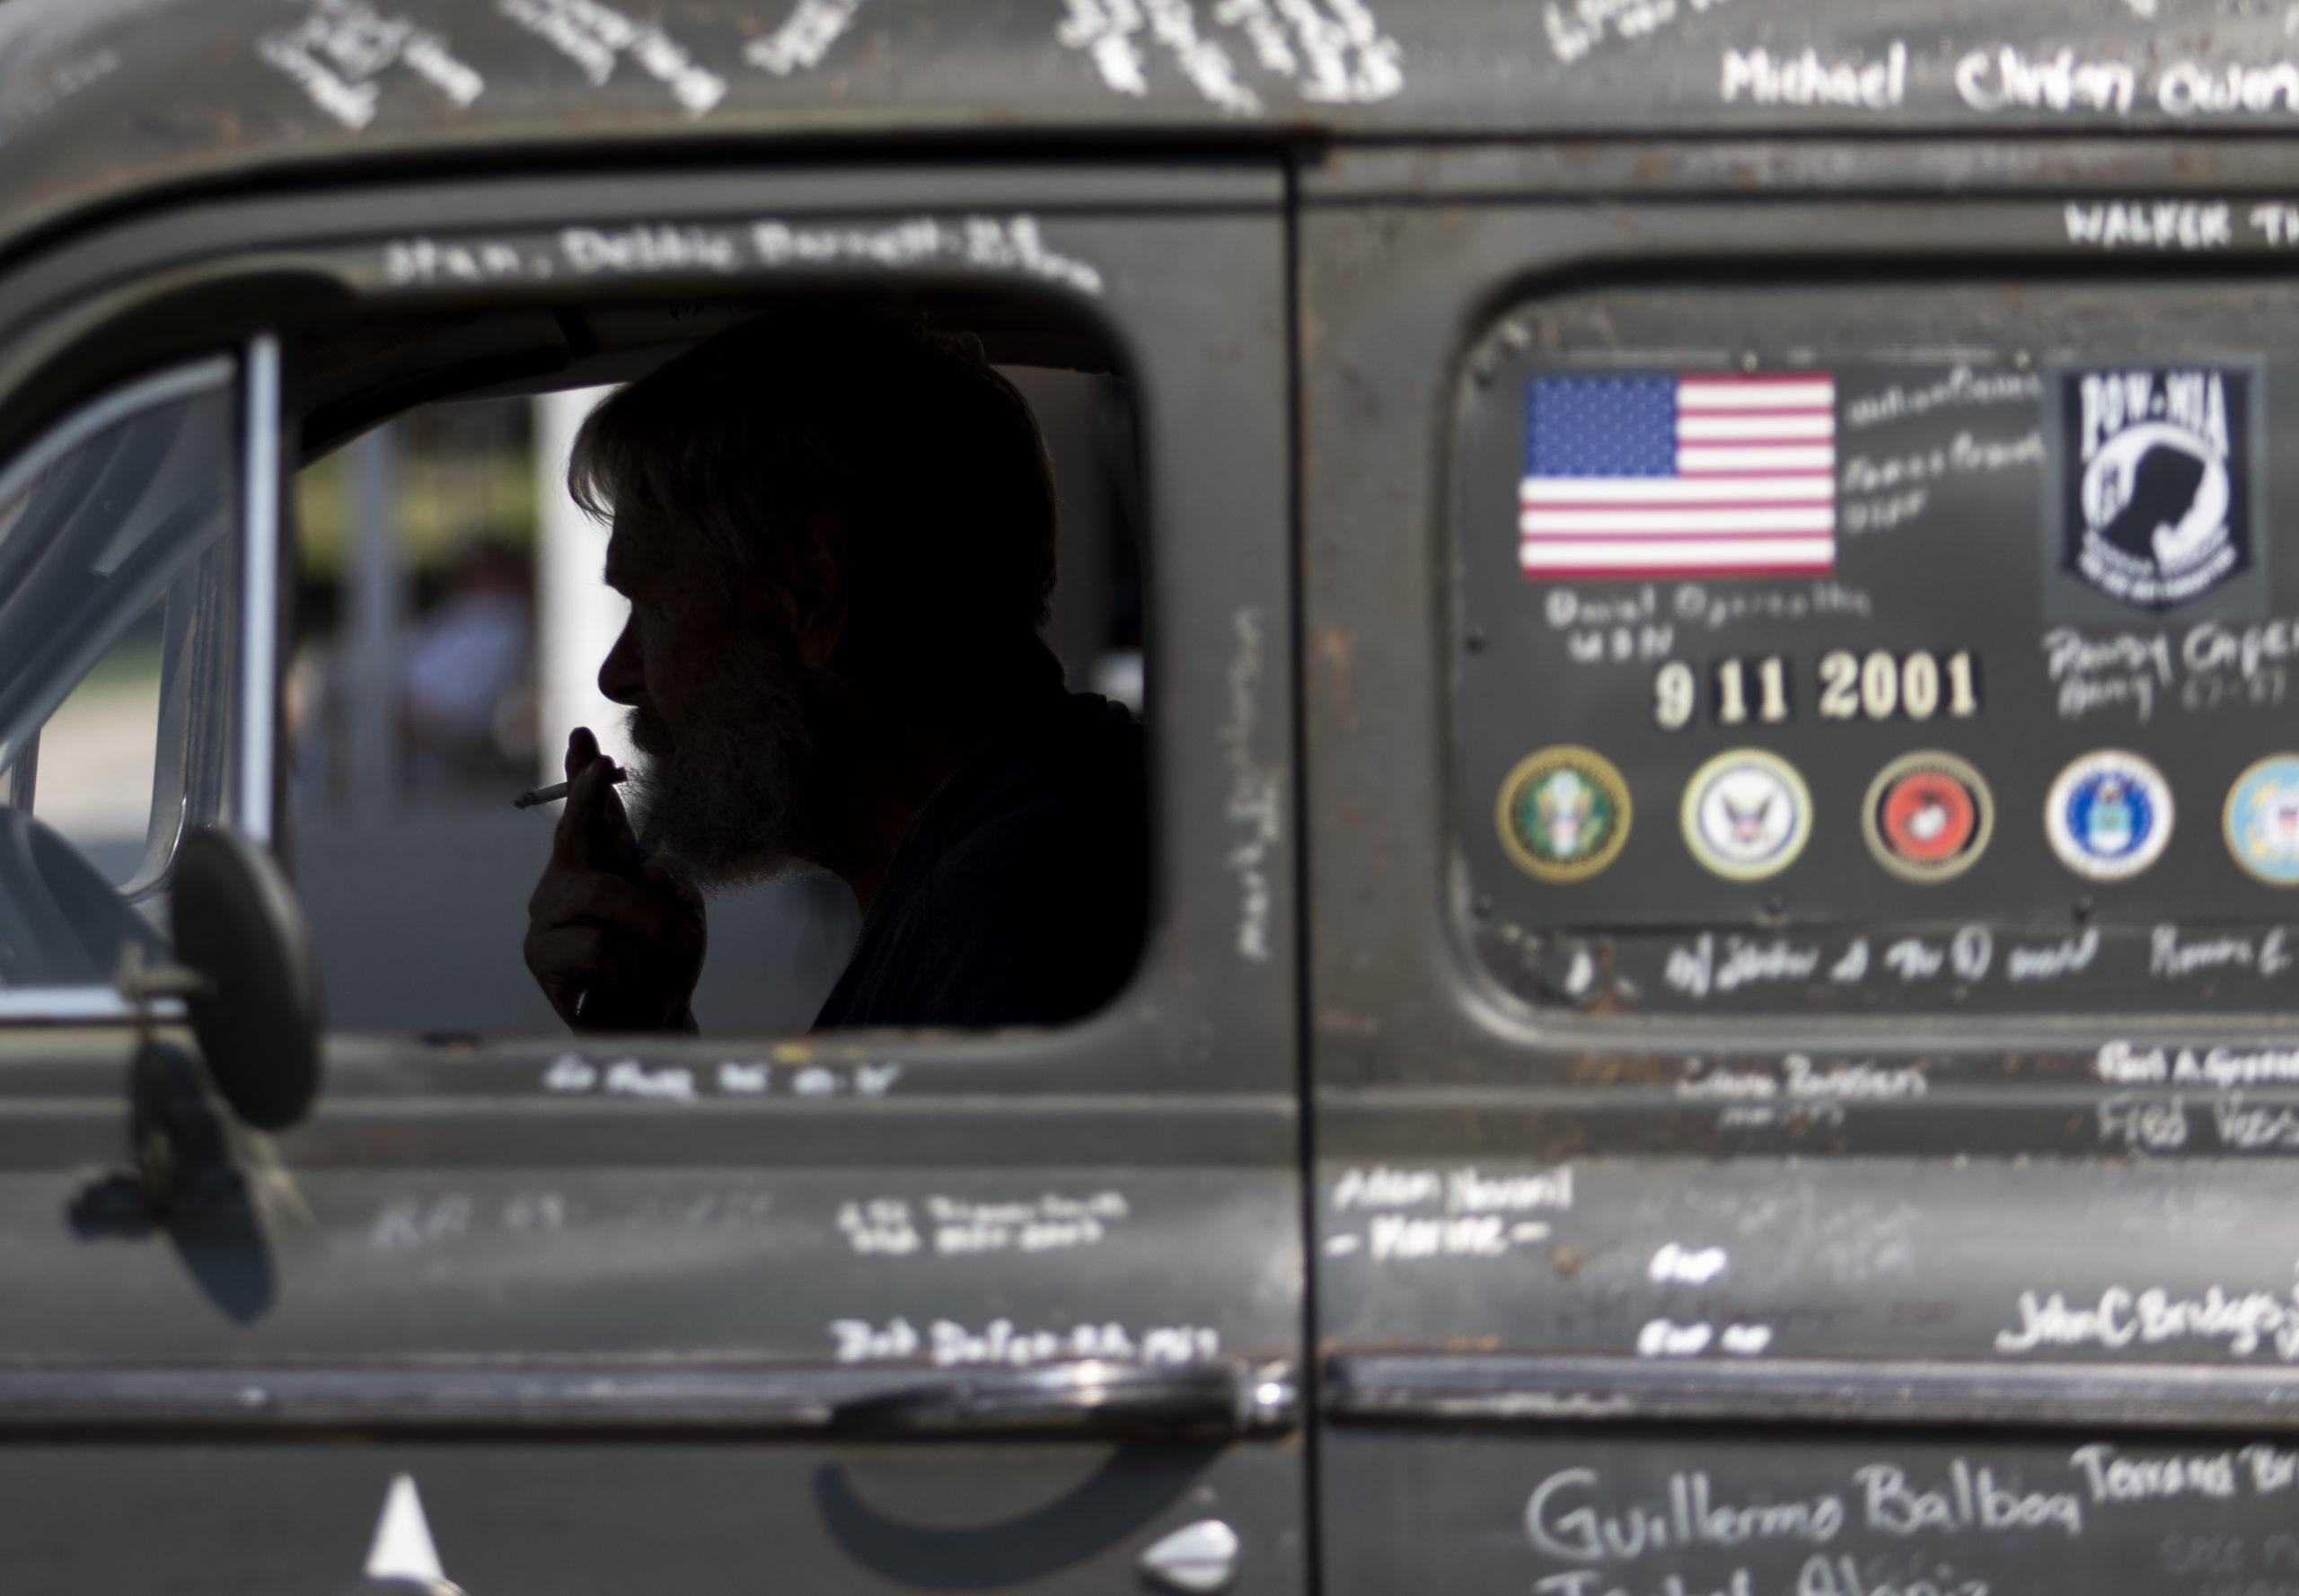 SamAugheFinal 1 1 scaled - Mobile Memorial: Sleepless night creates veteran memorial